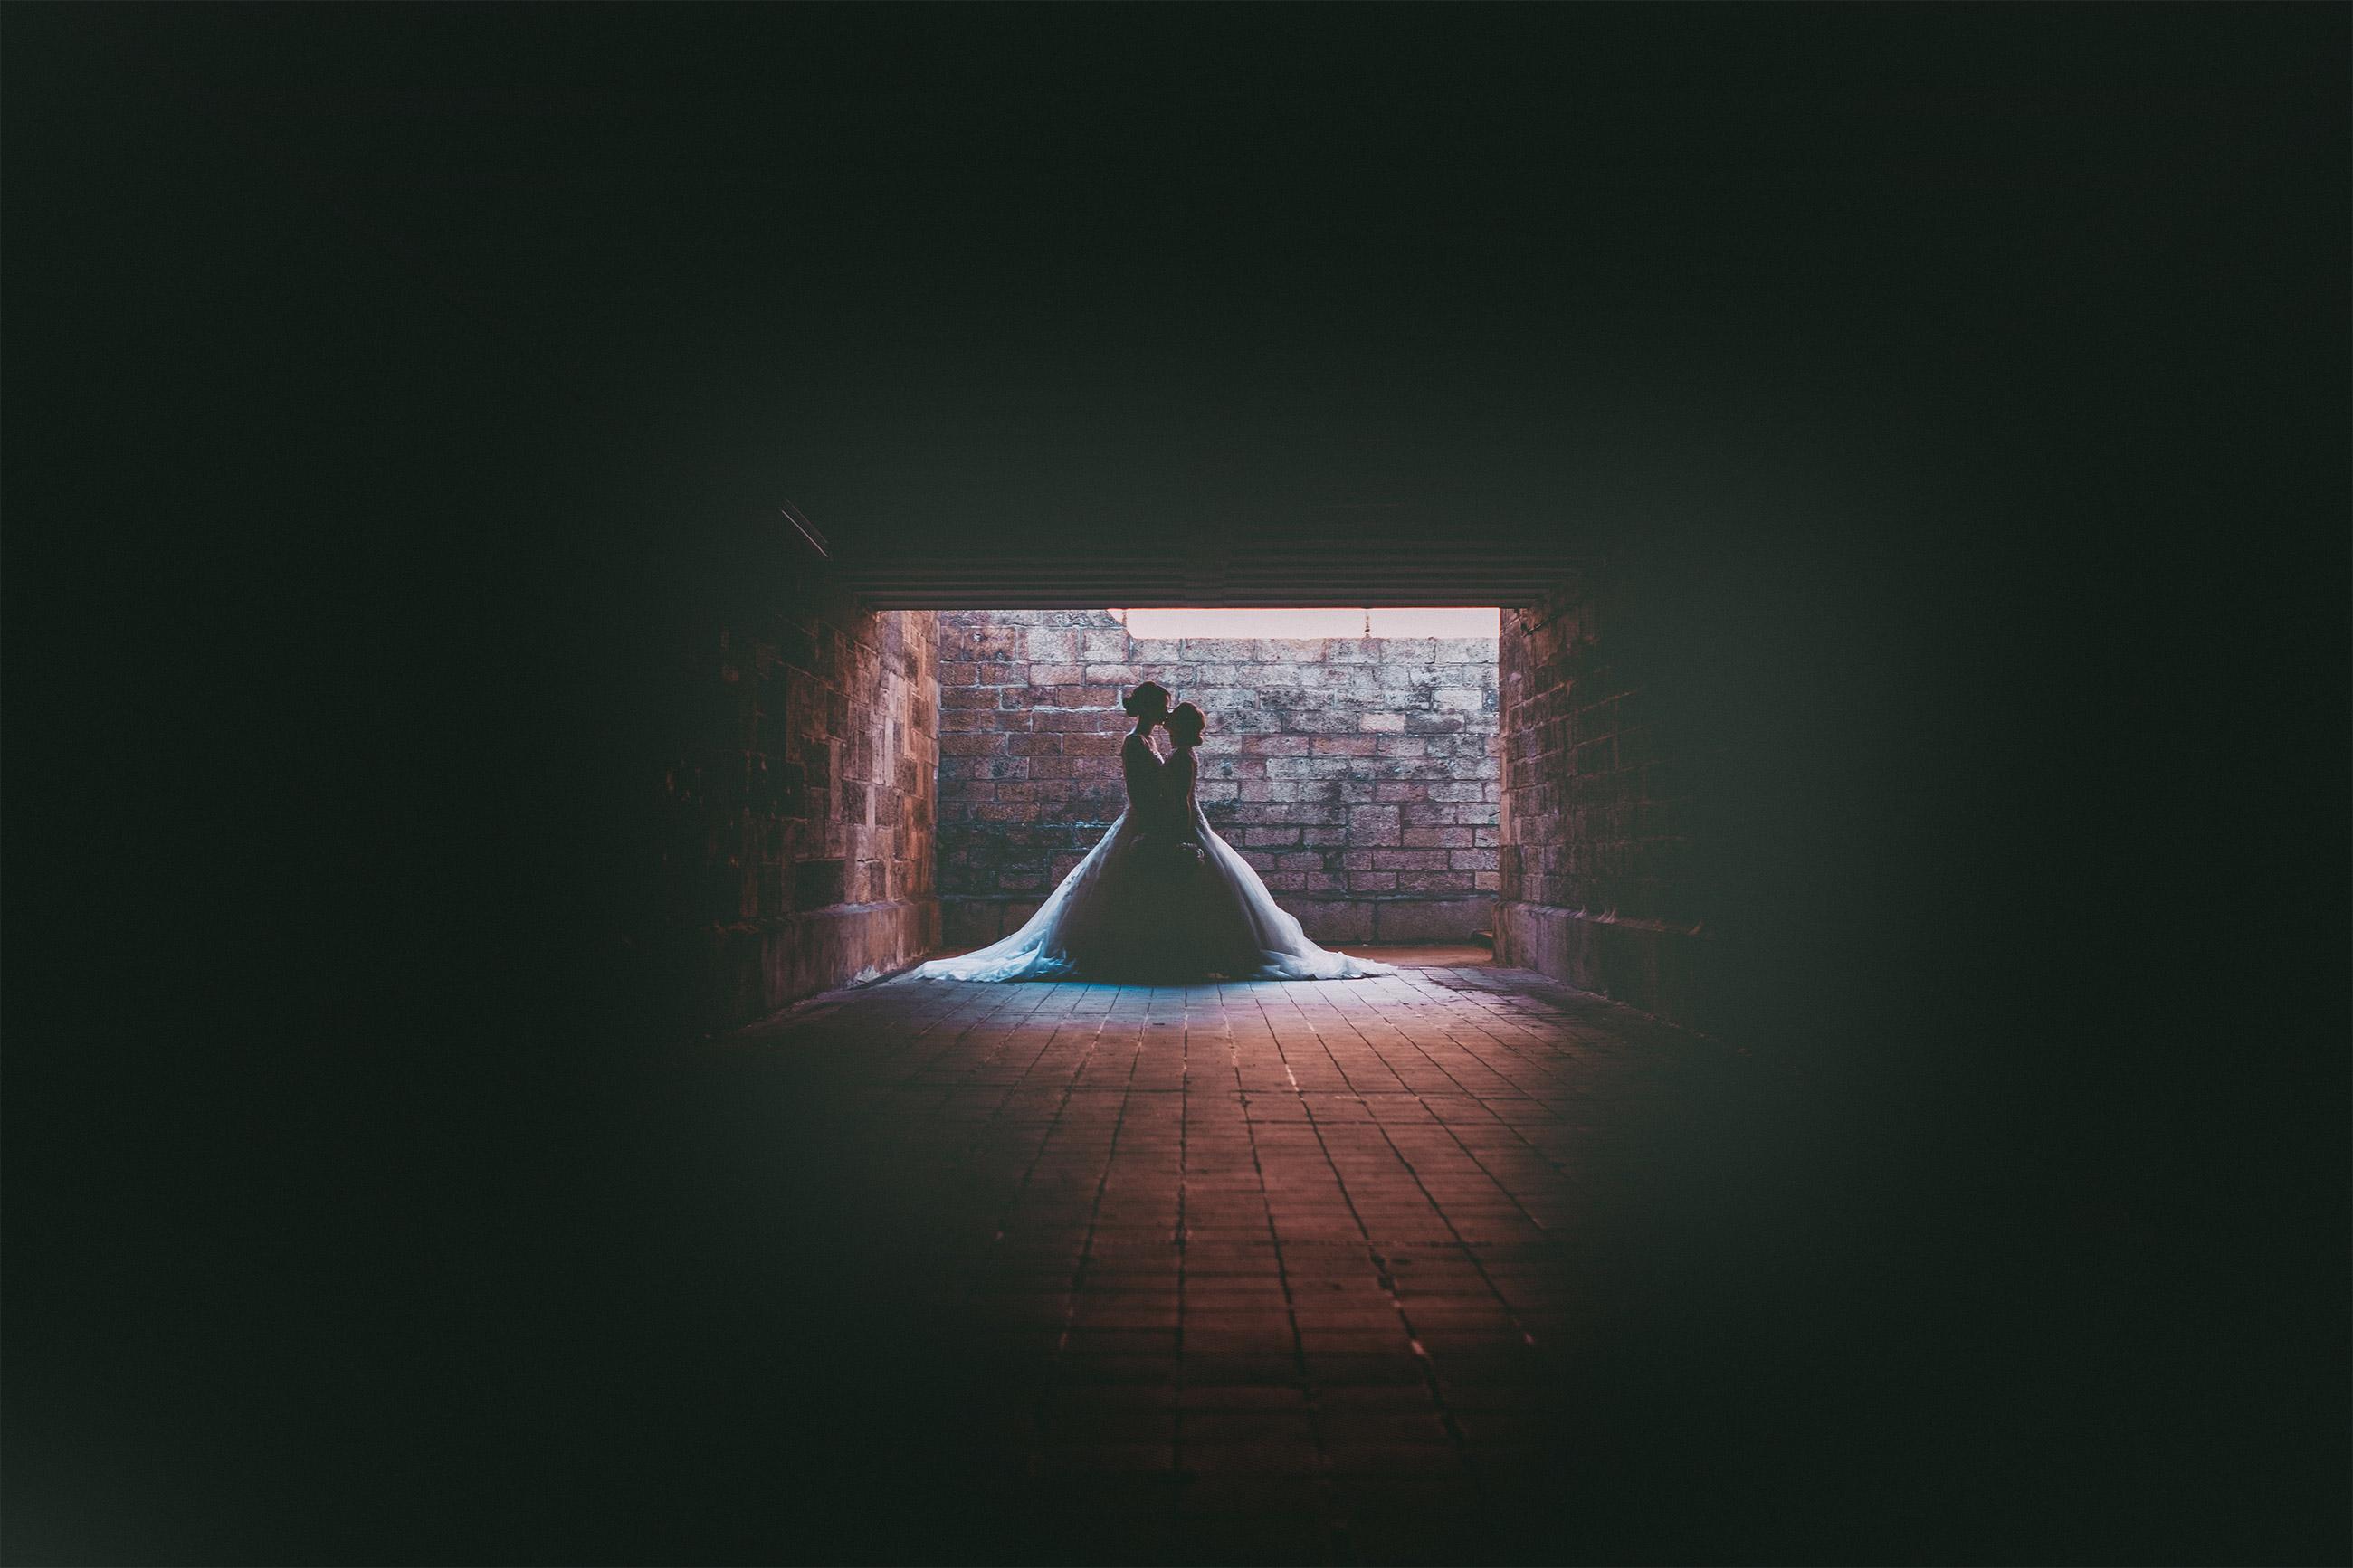 Hochzeitsfotograf • Vitali Skidan Hochzeitsfotograf Darmstadt ≈ Vitali Skidan